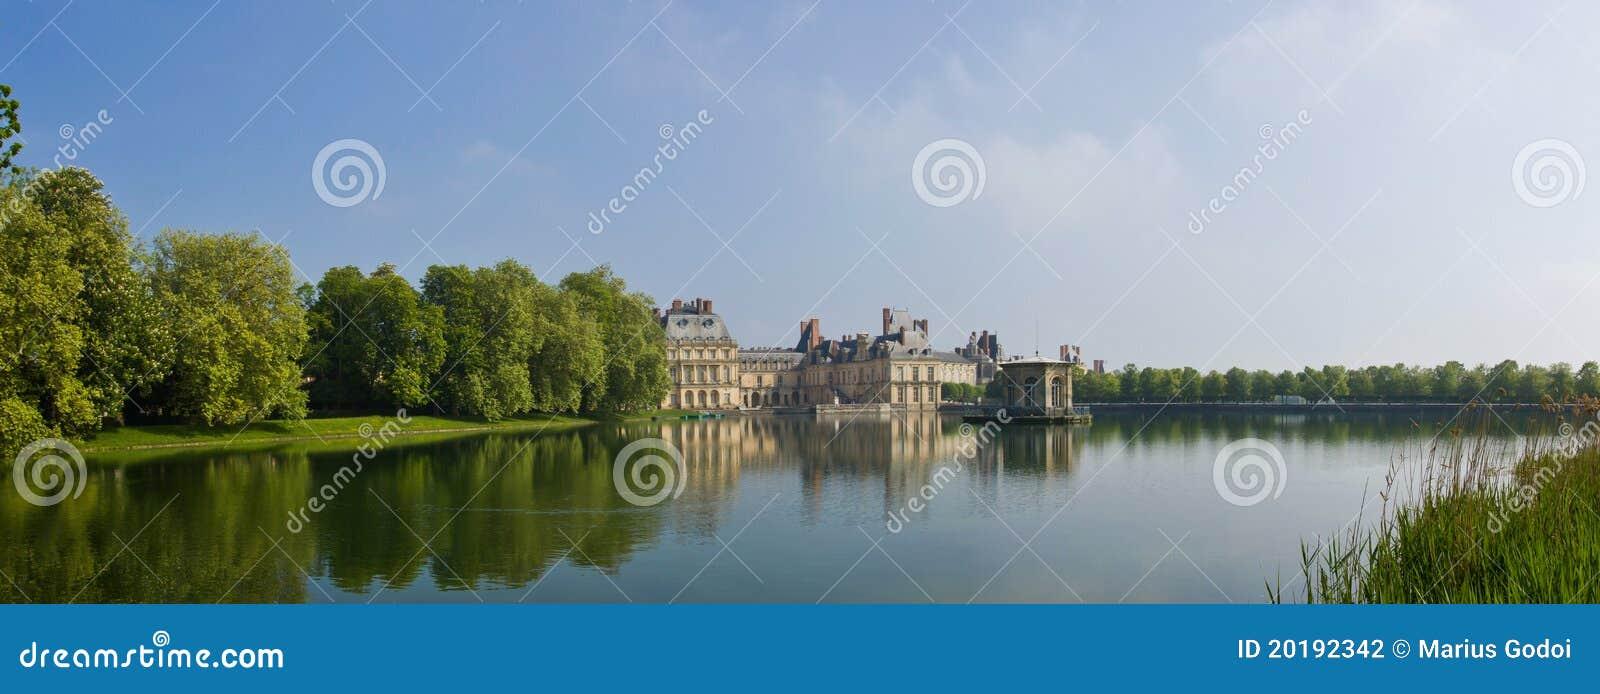 панорама fontainebleau замока